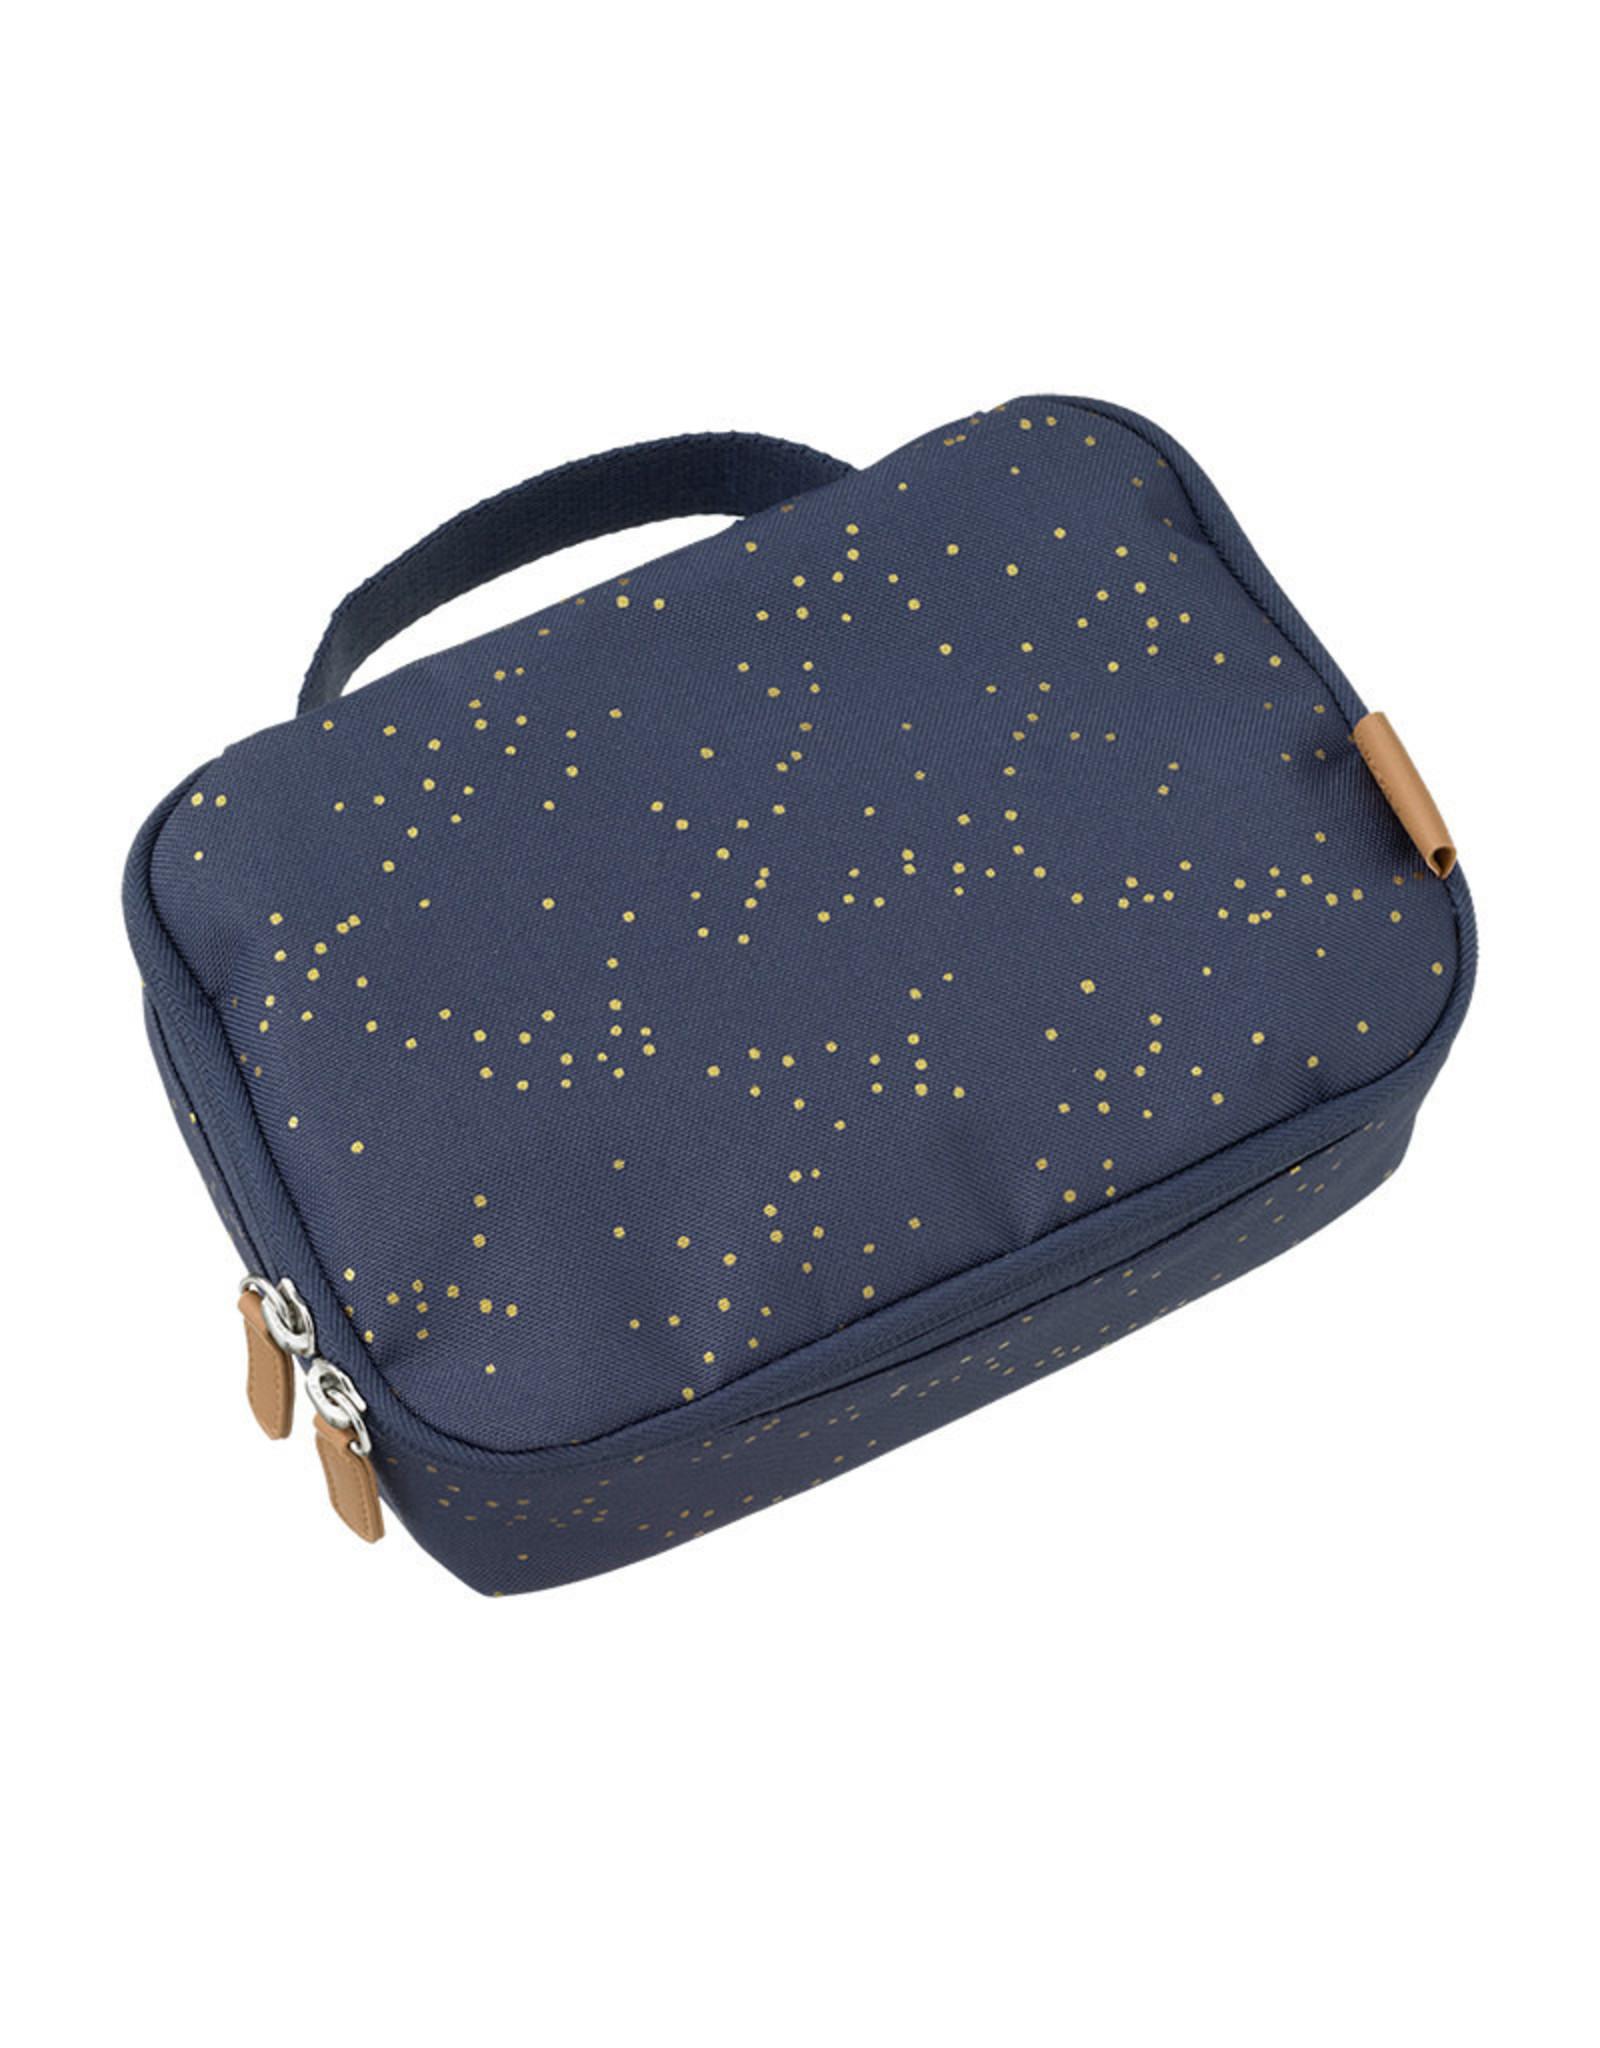 Fresk Fresk Lunchbag Indigo Dots Gold